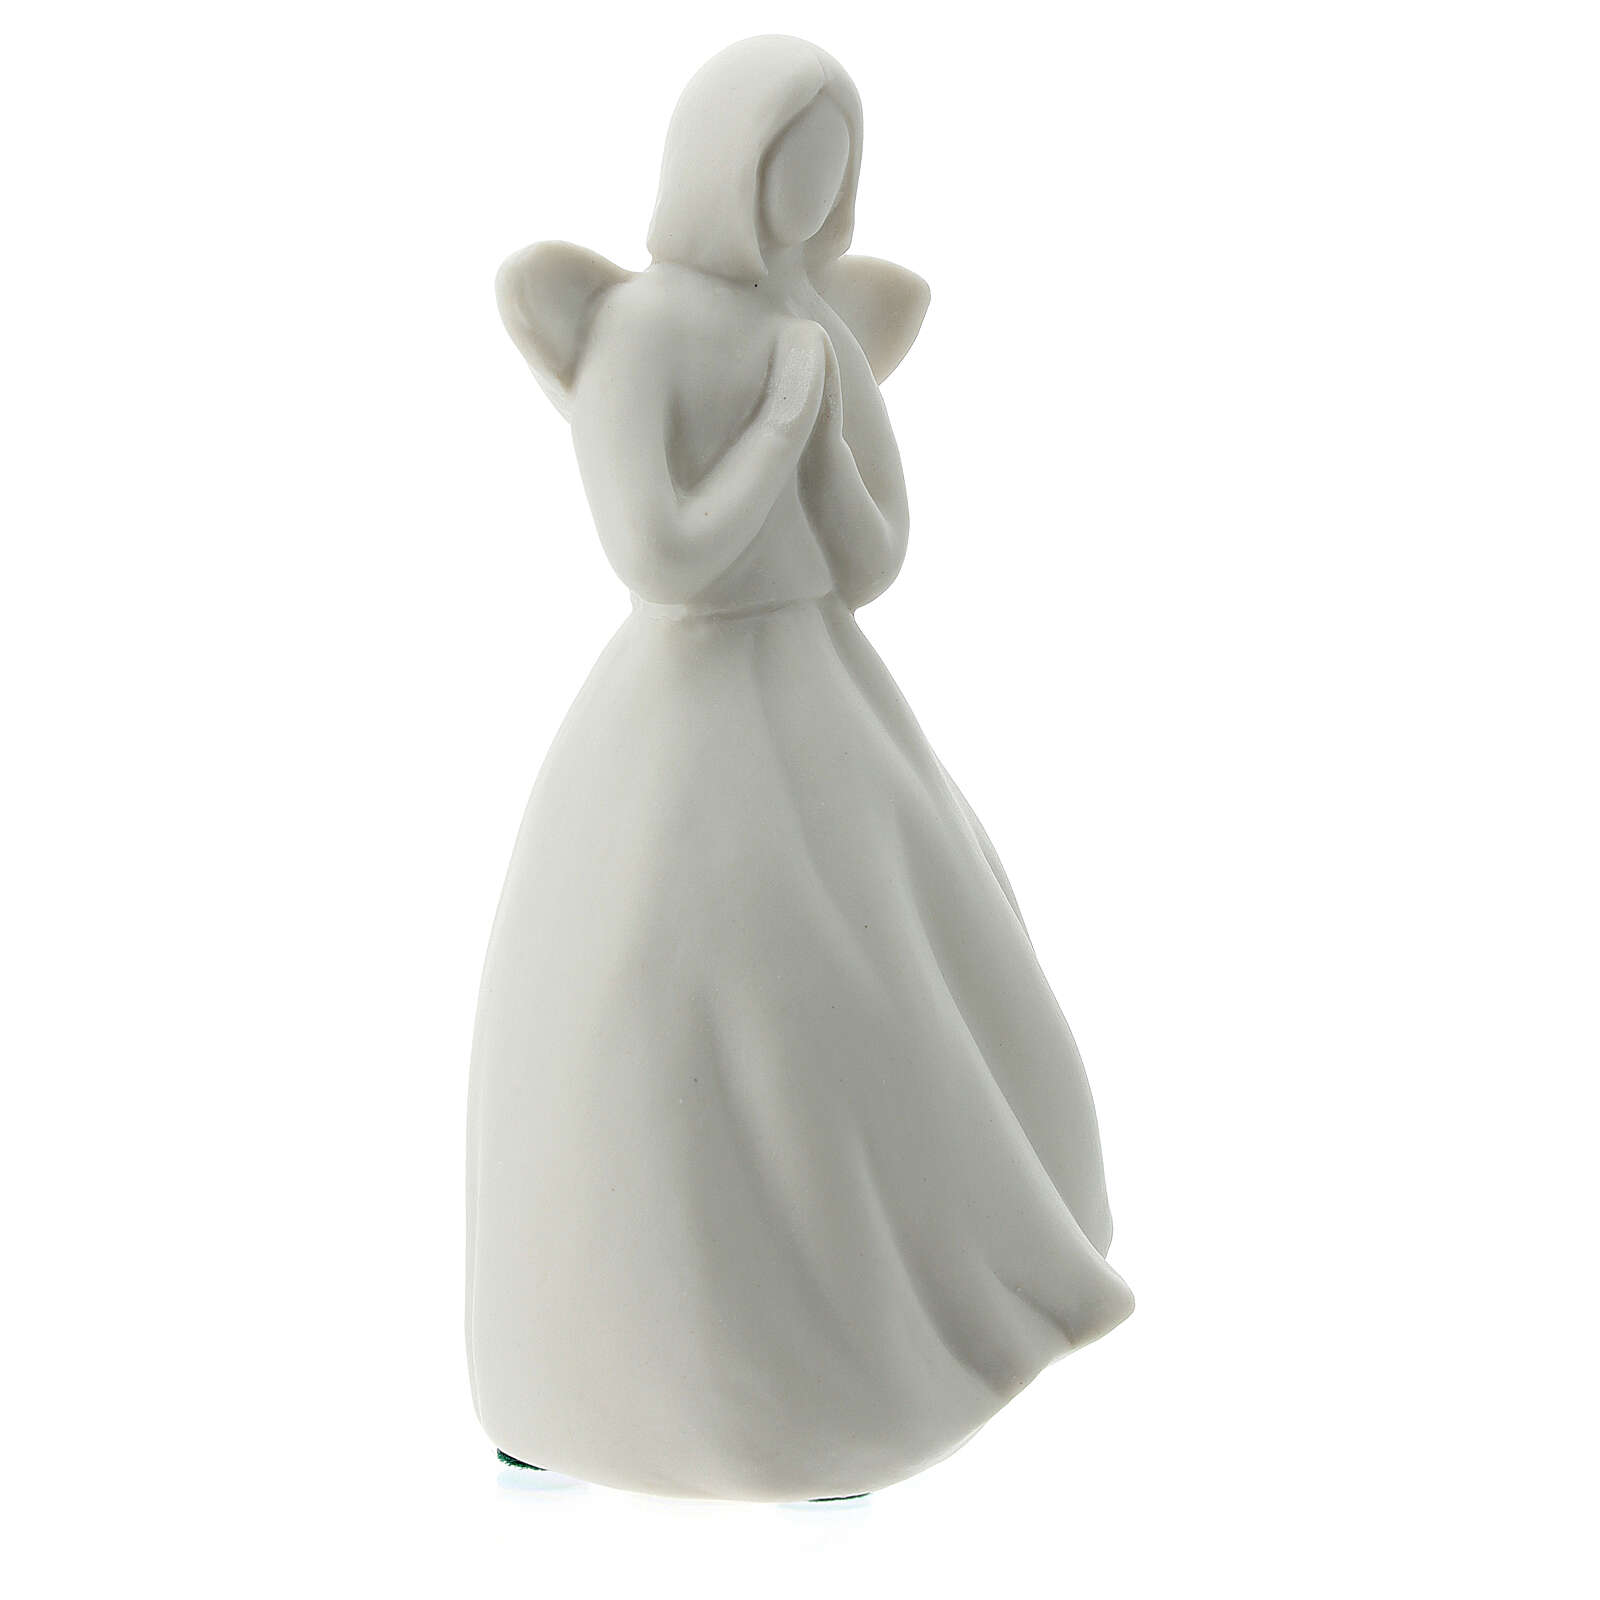 Ángel 14 cm porcelana blanca 3